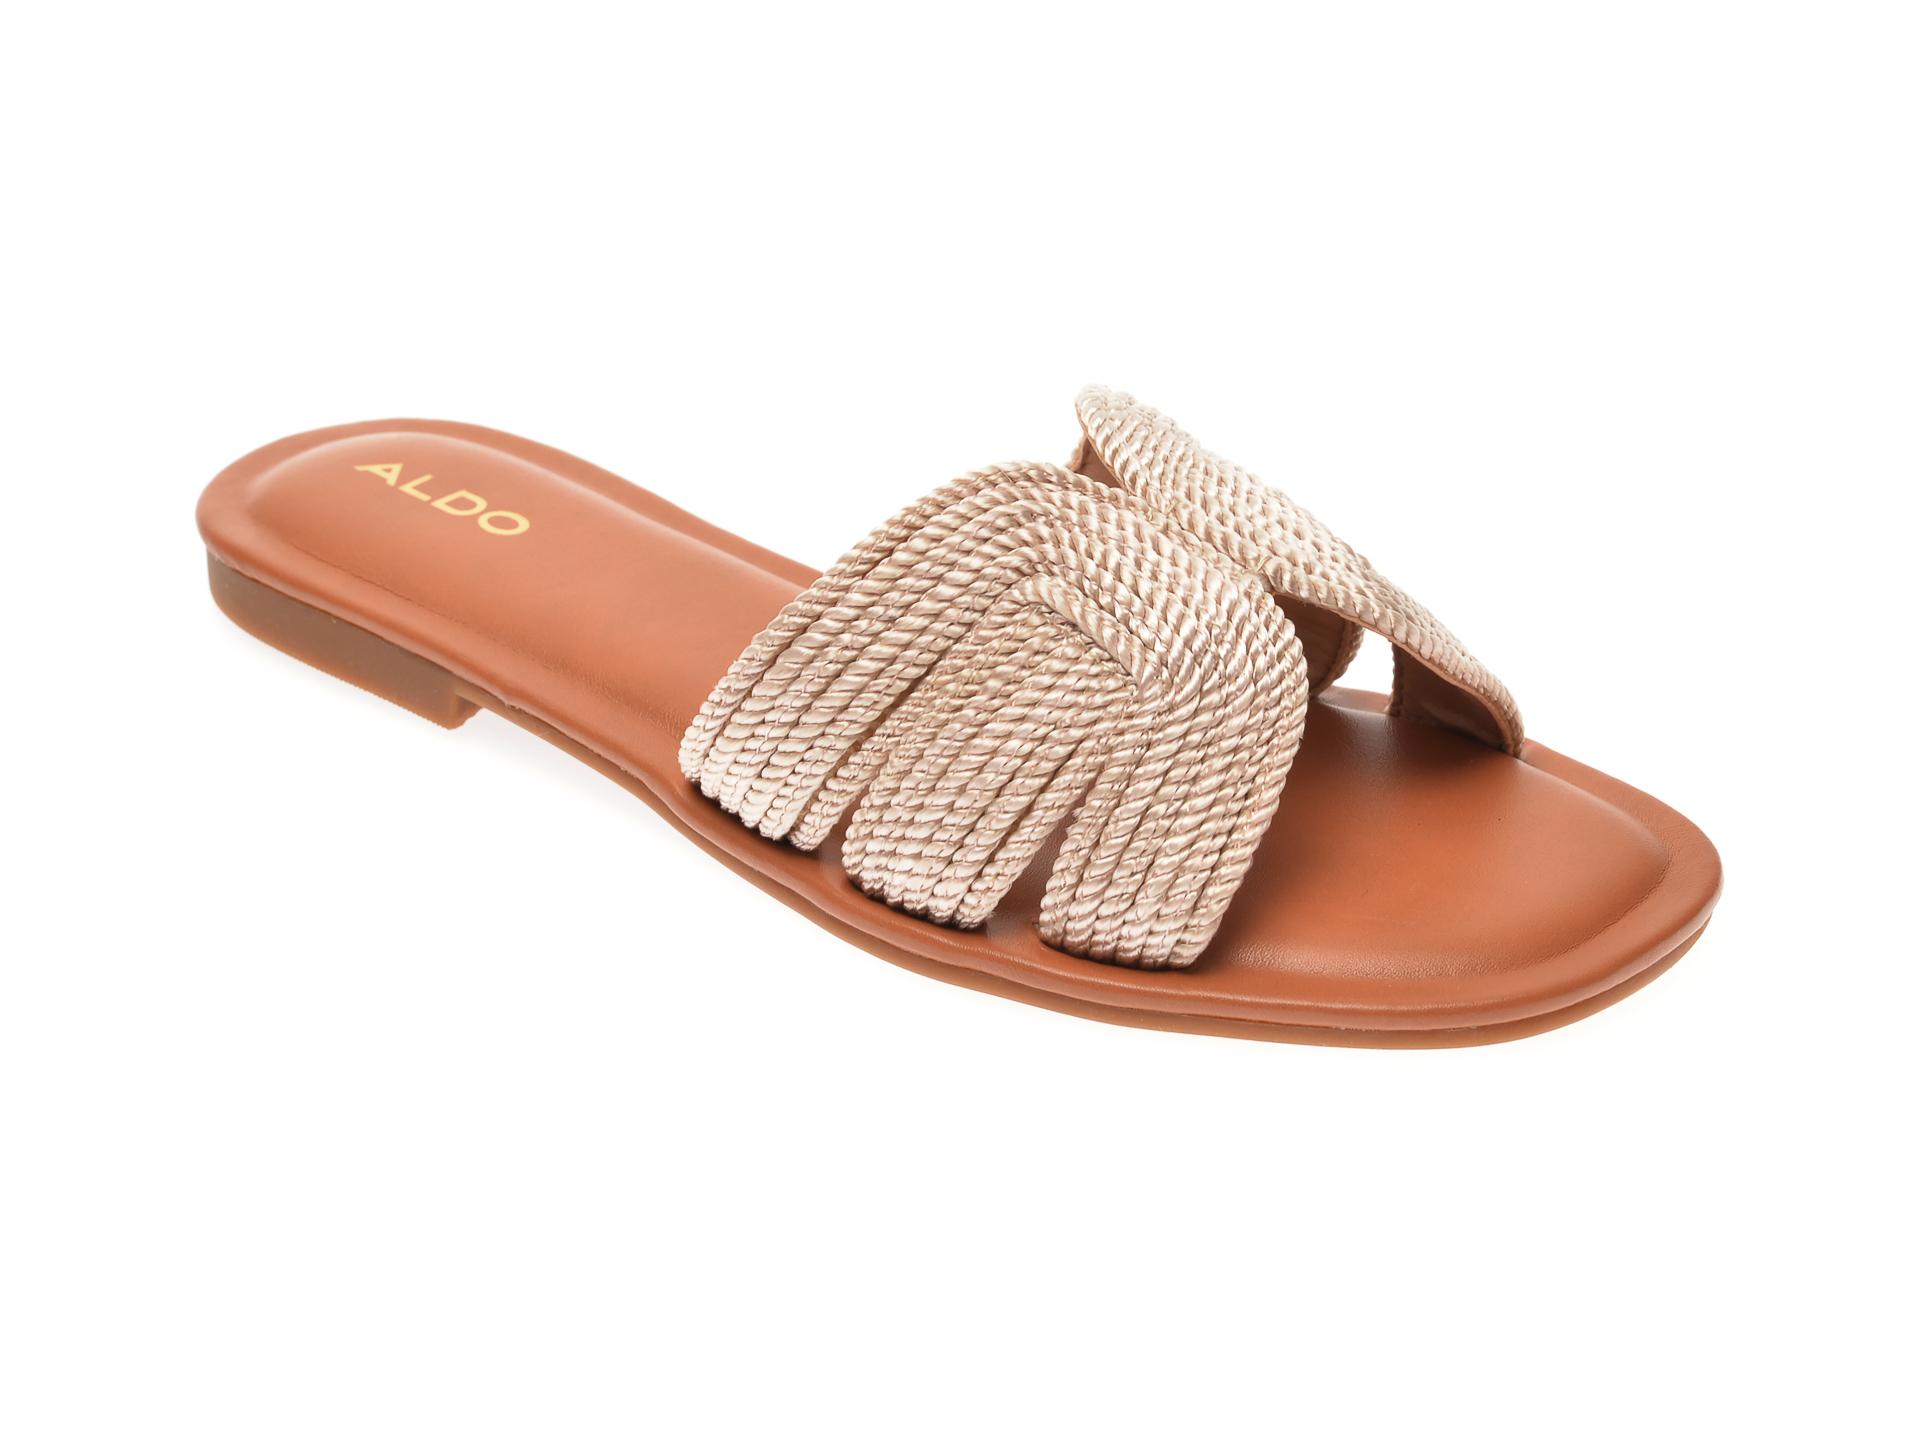 Papuci ALDO nude, Starlight270, din material textil